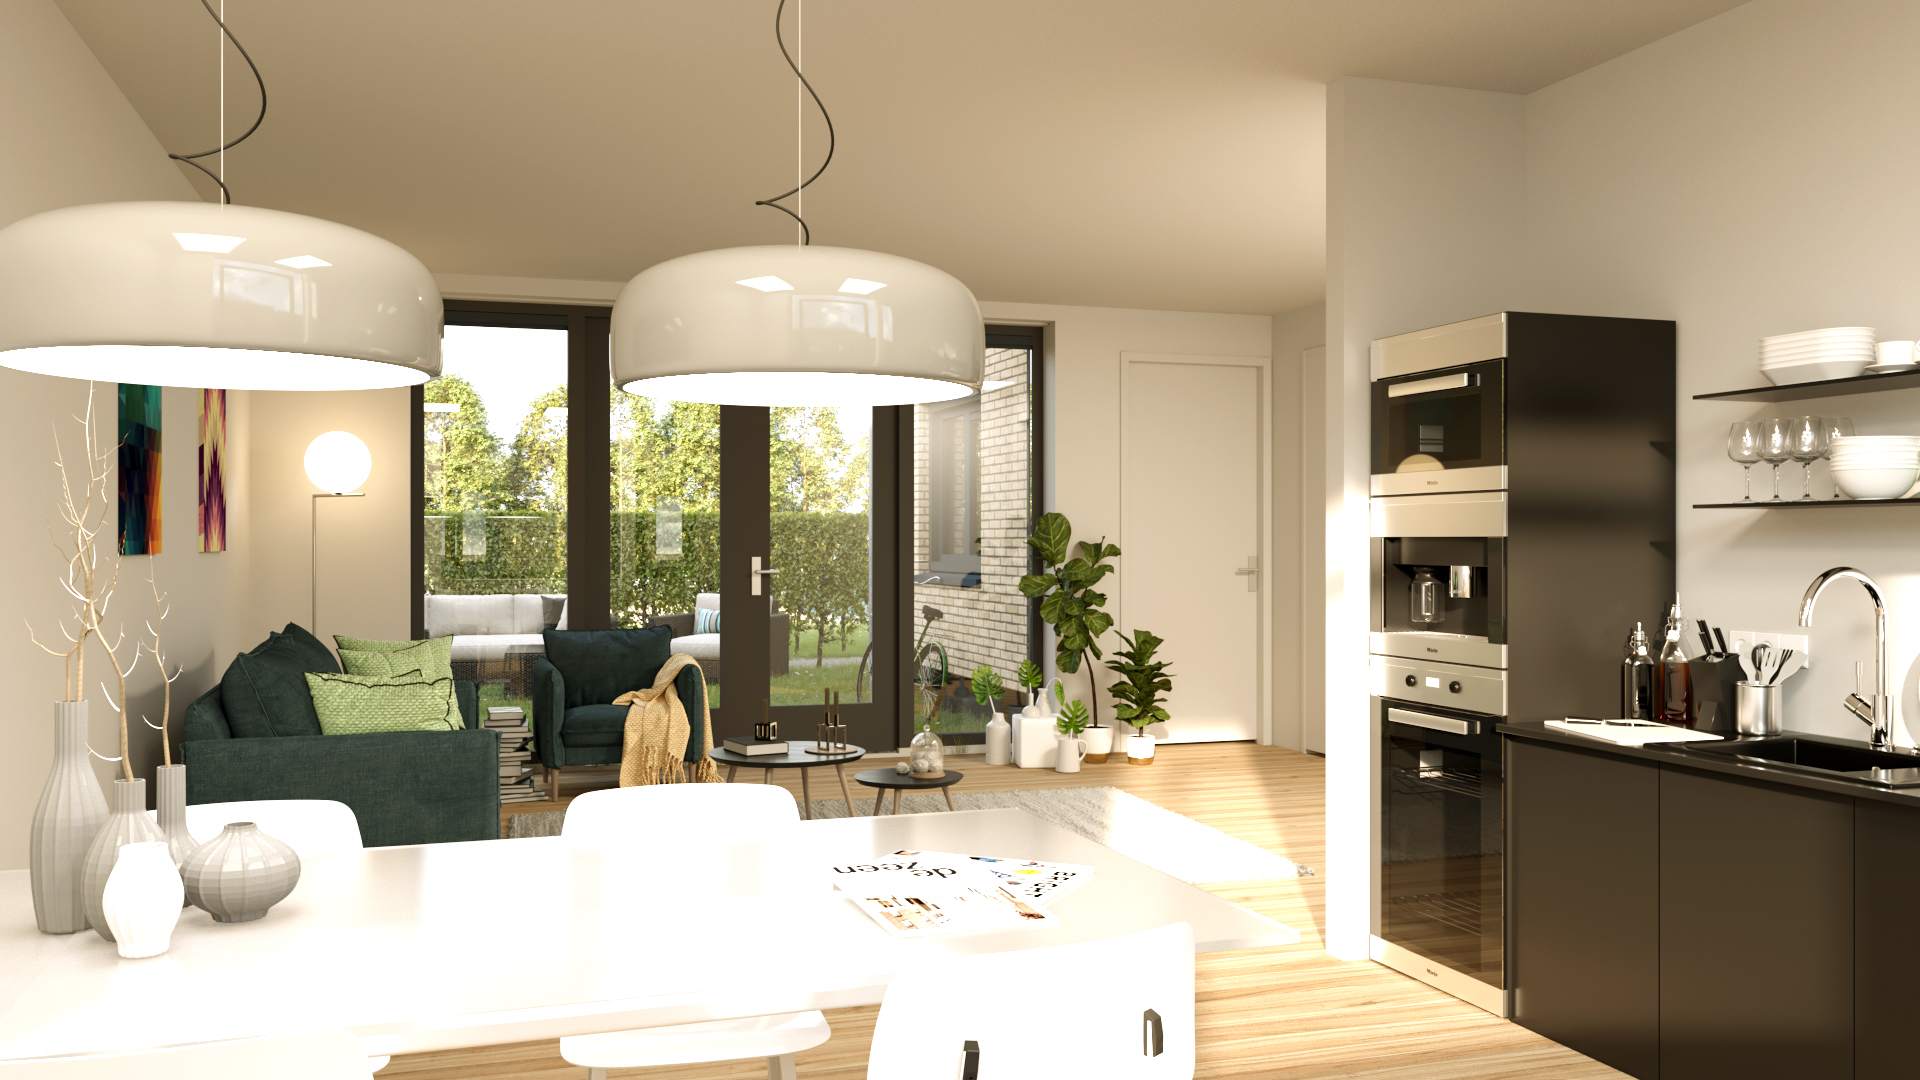 Interieur van duurzame patio bungalows woningen Dennenhof Loon op Zand